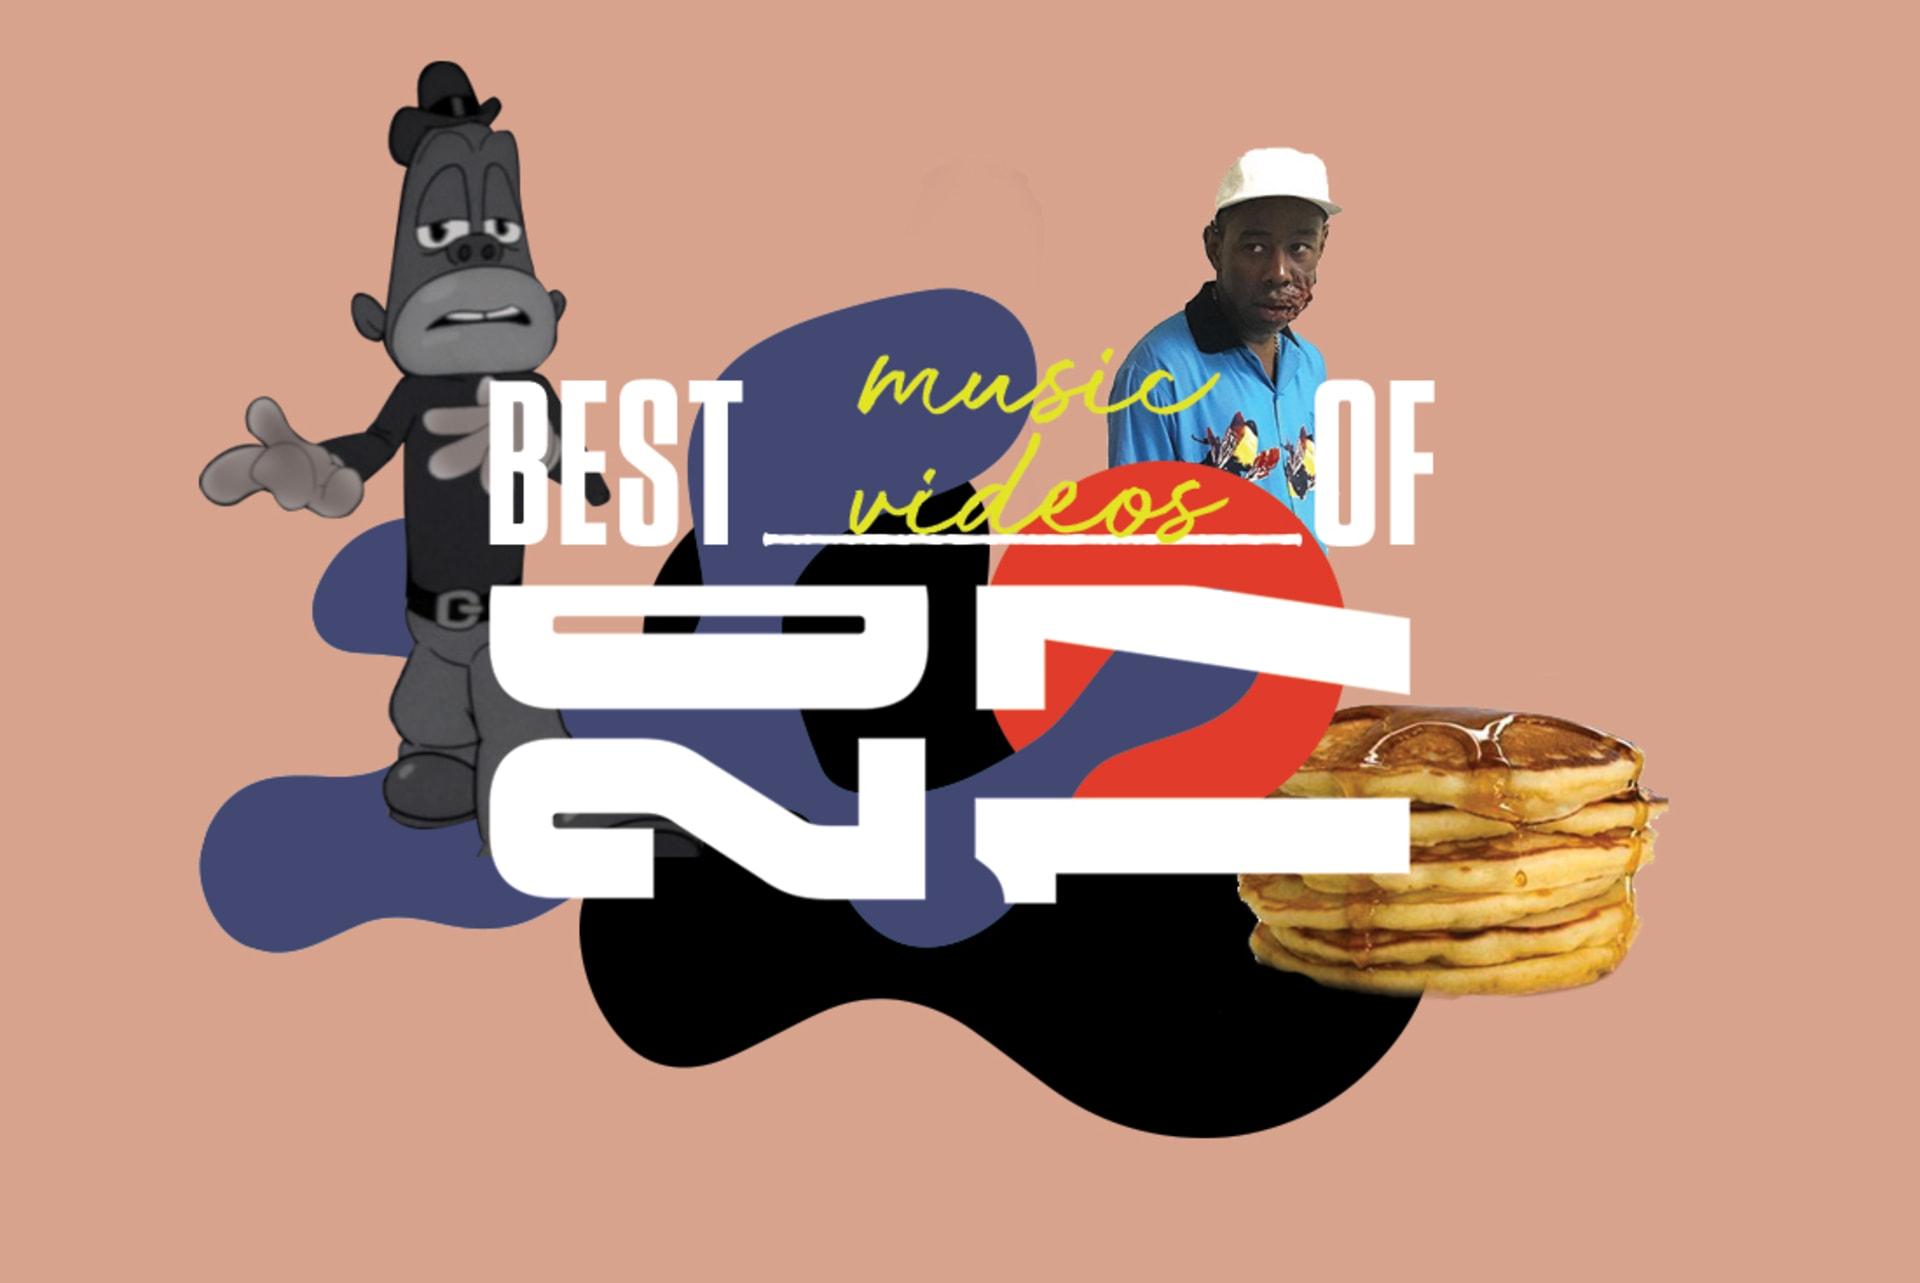 Best Music Videos of 2017